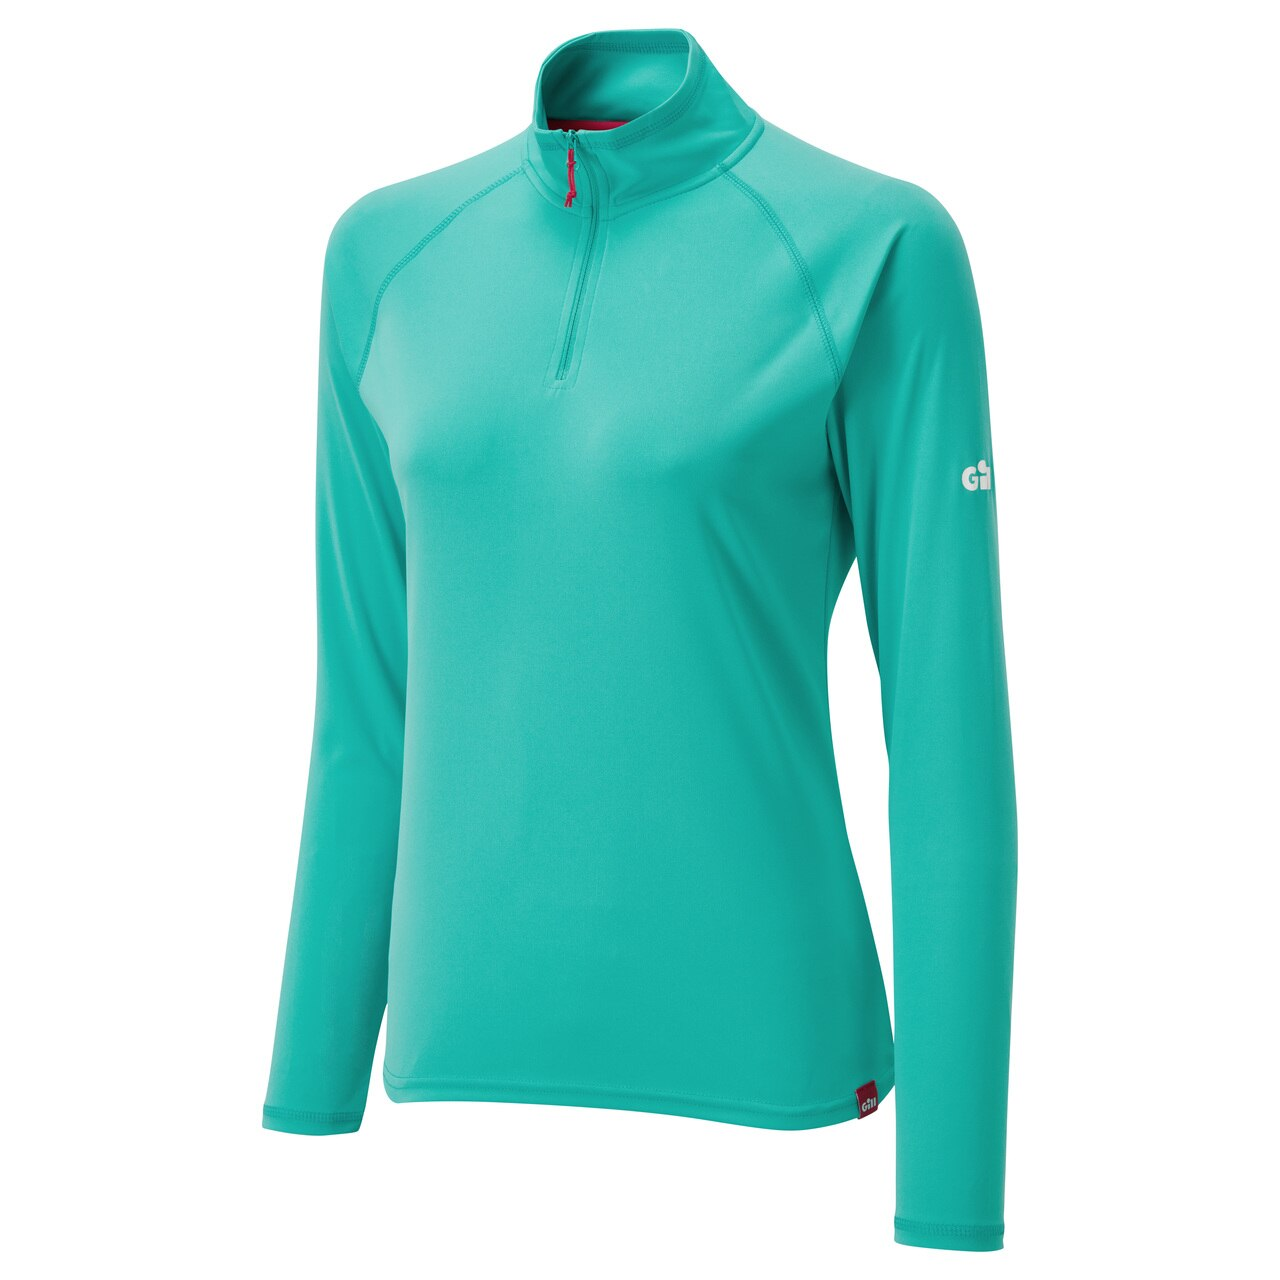 Women's UV Tec Long Sleeve Zip Tee - UV009W-TUR02-2.jpg